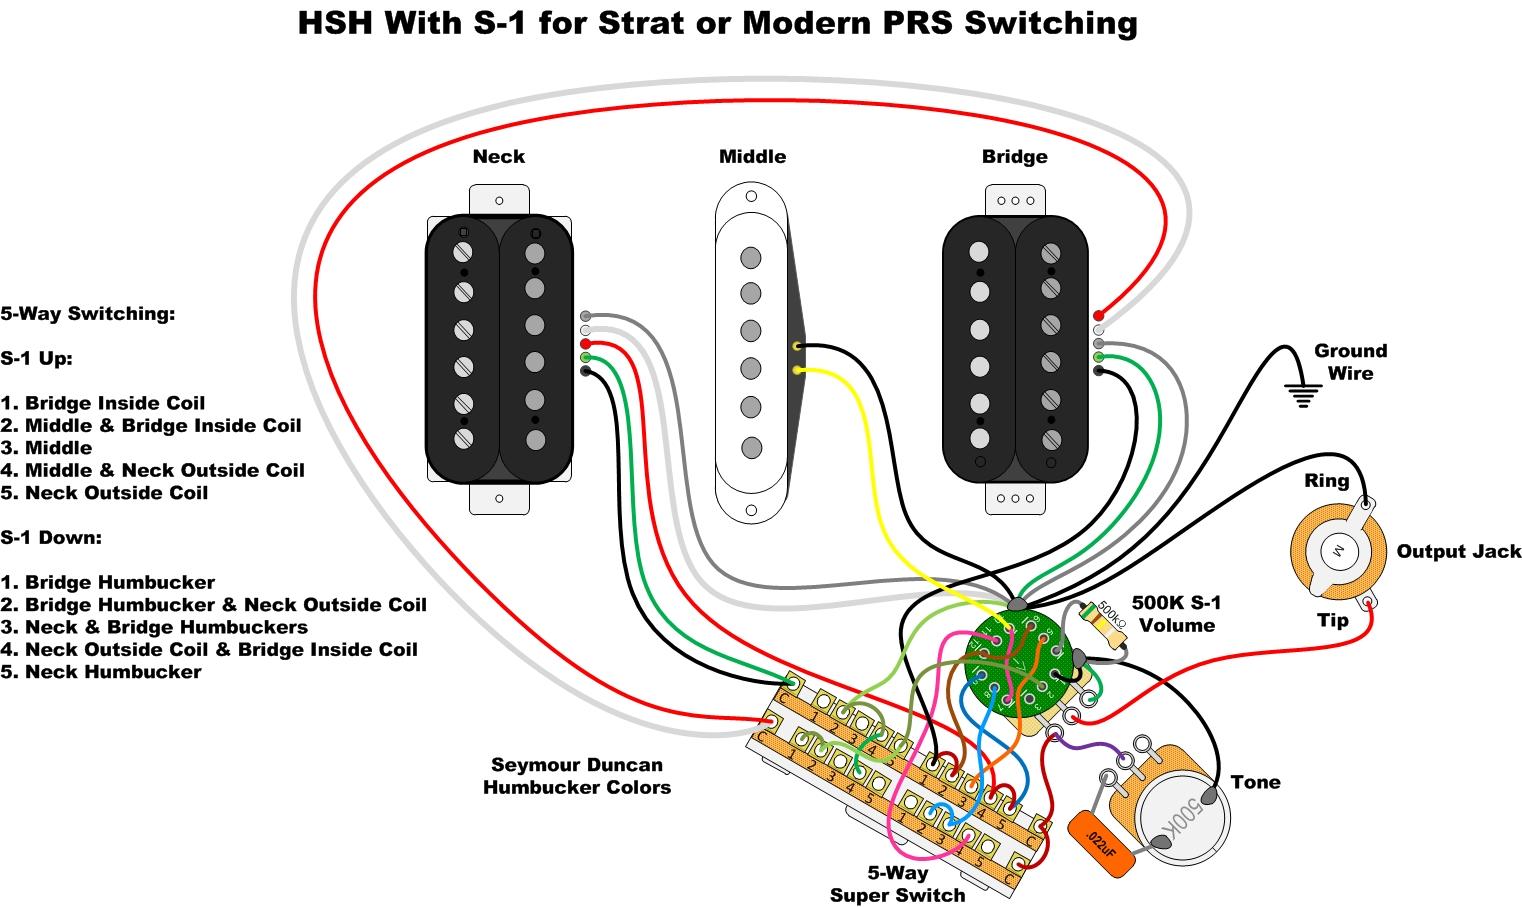 https://res.cloudinary.com/phostenix/image/upload/GuitarWiring/HSH-StratPRSS-1-SD2.jpg